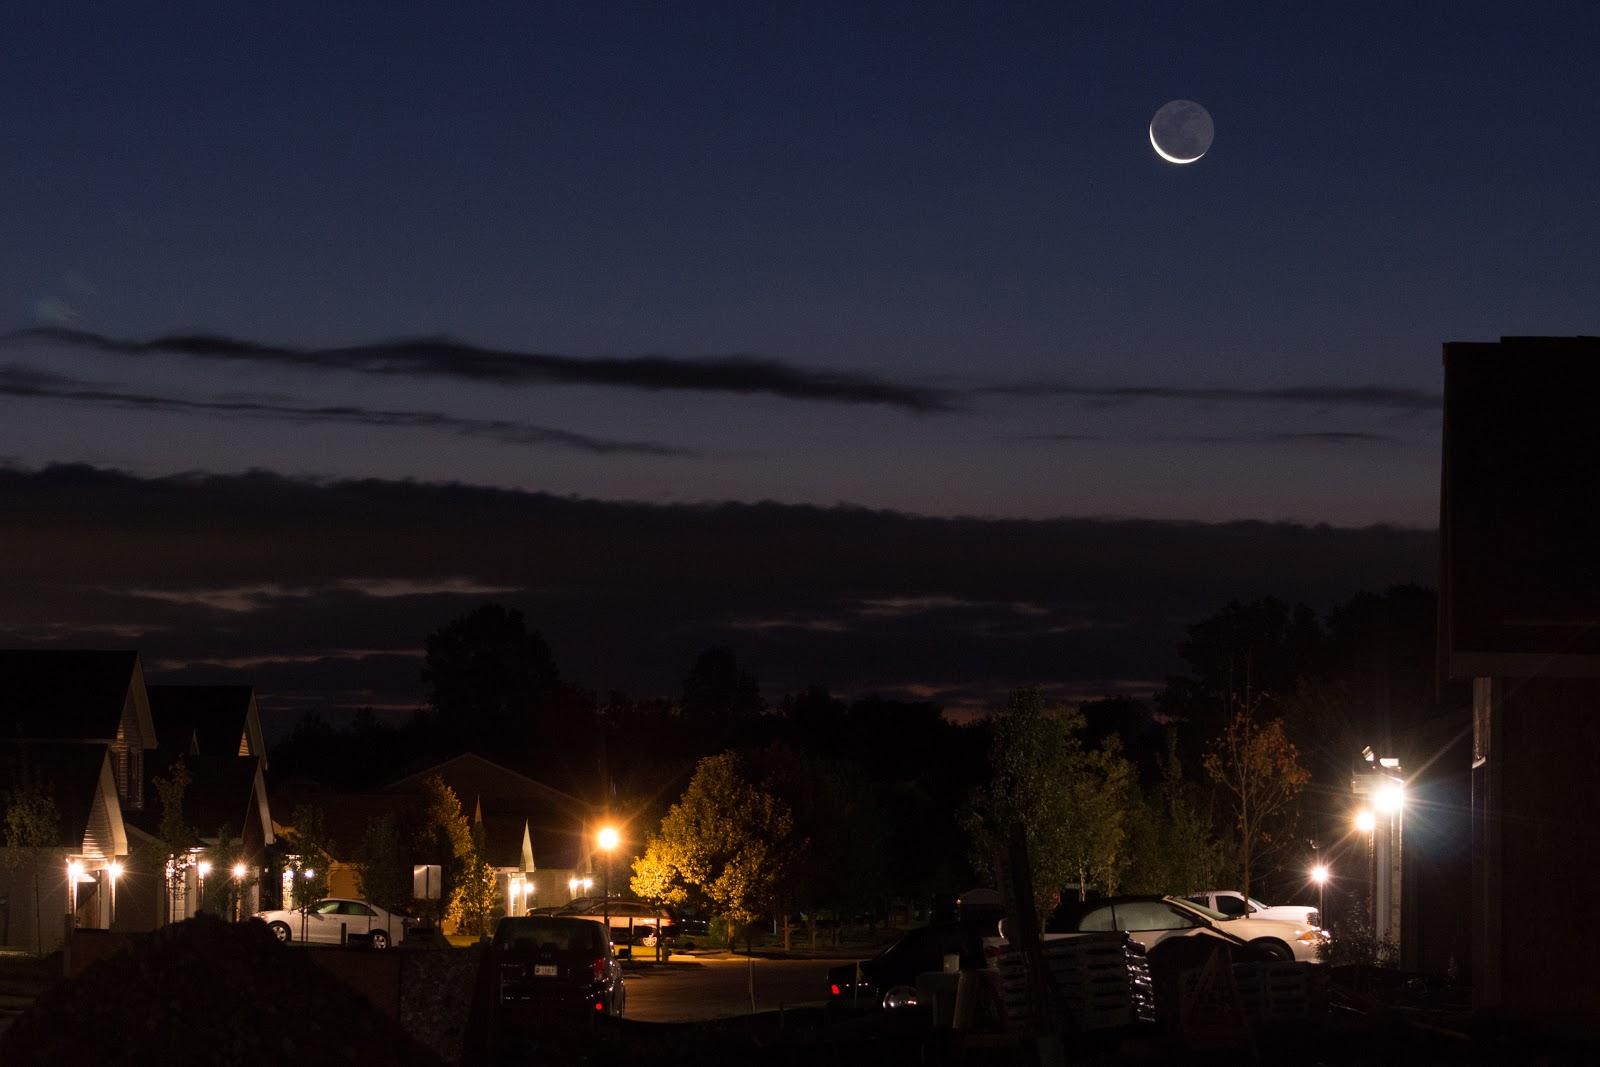 moon with earthshine over street